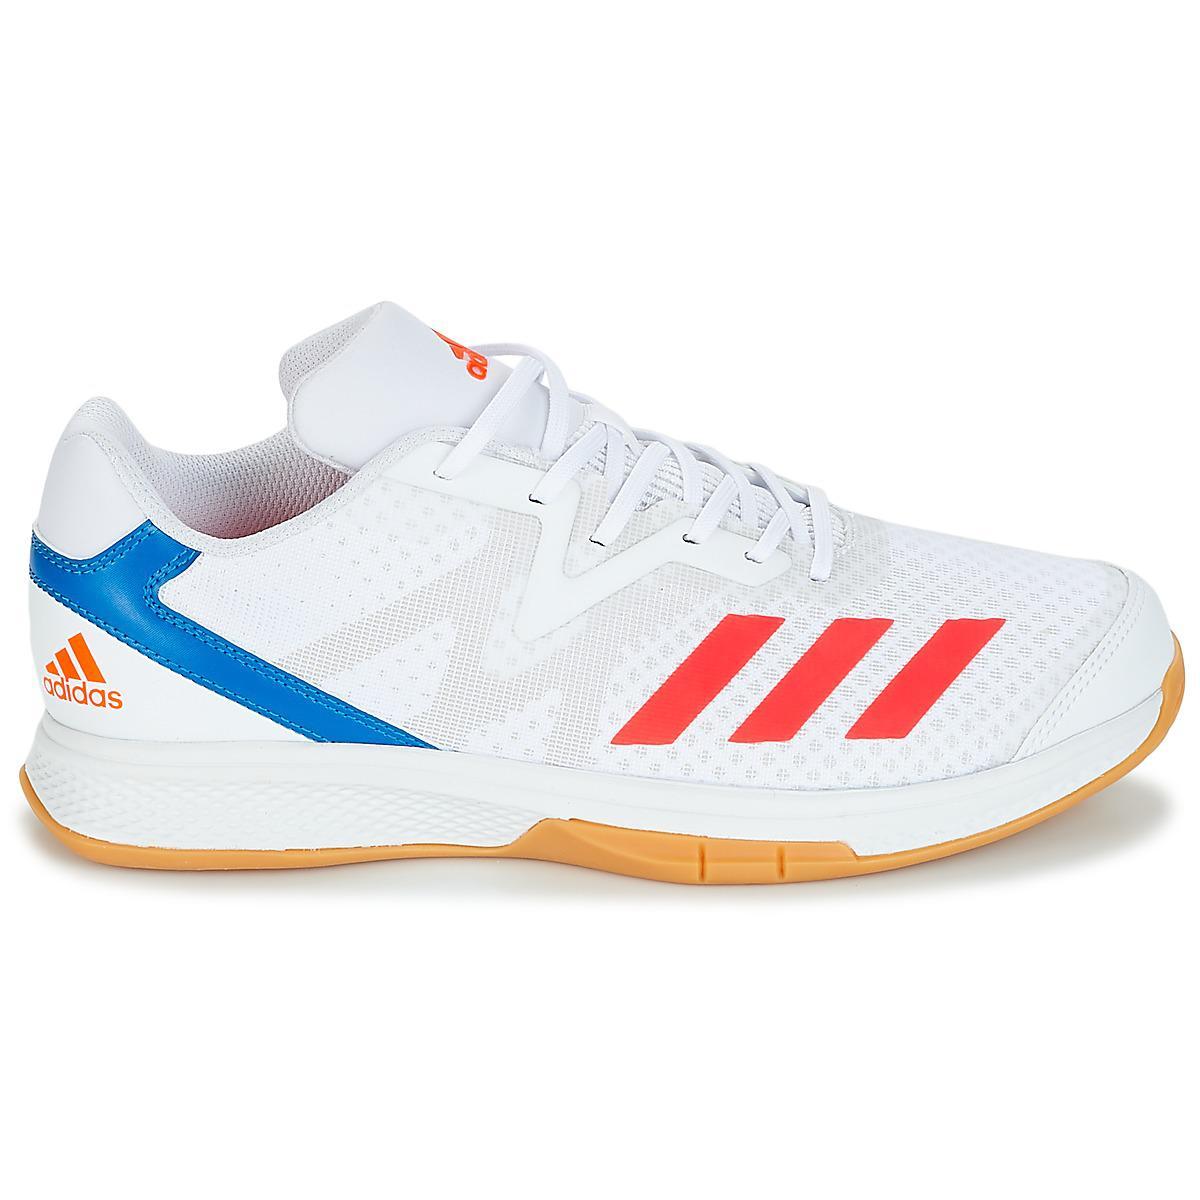 on sale e6072 ccfa9 adidas Counterblast Exadic Mens Indoor Sports Trainers (shoe